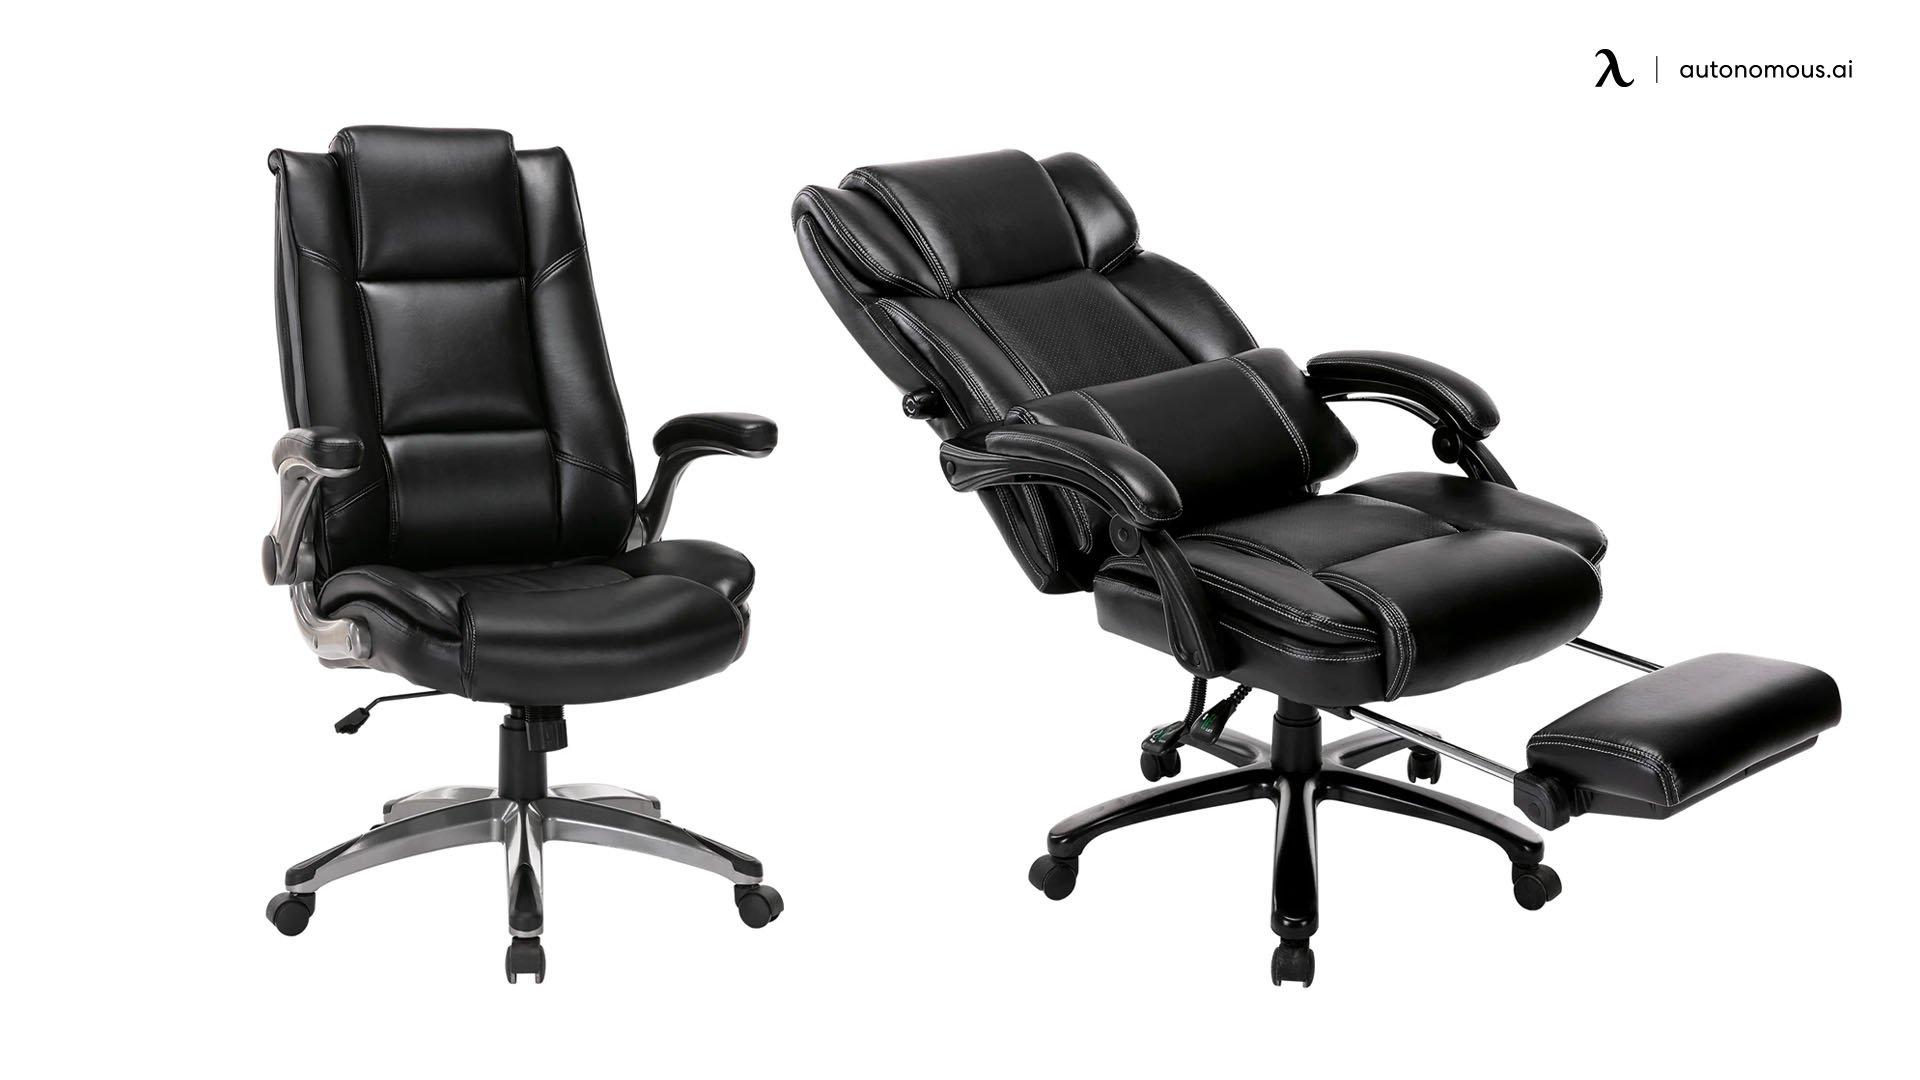 STARSPACE - ergonomic office chair design